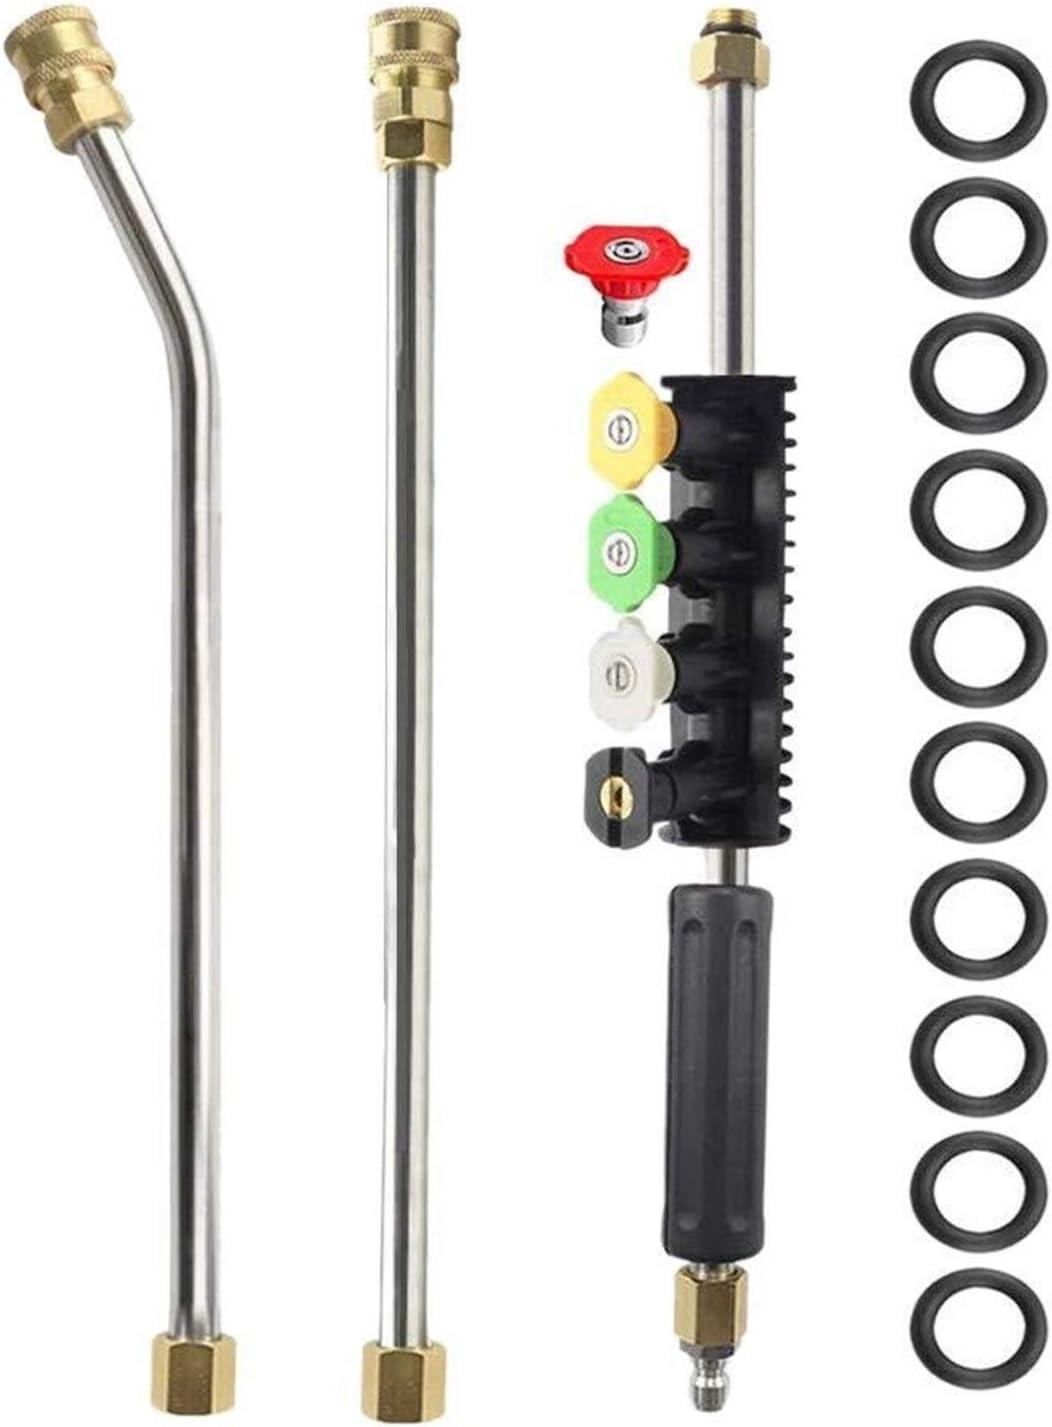 YJYGR Pressure Washer Regular store Extension Wand Lance 45 Soldering Power Noz